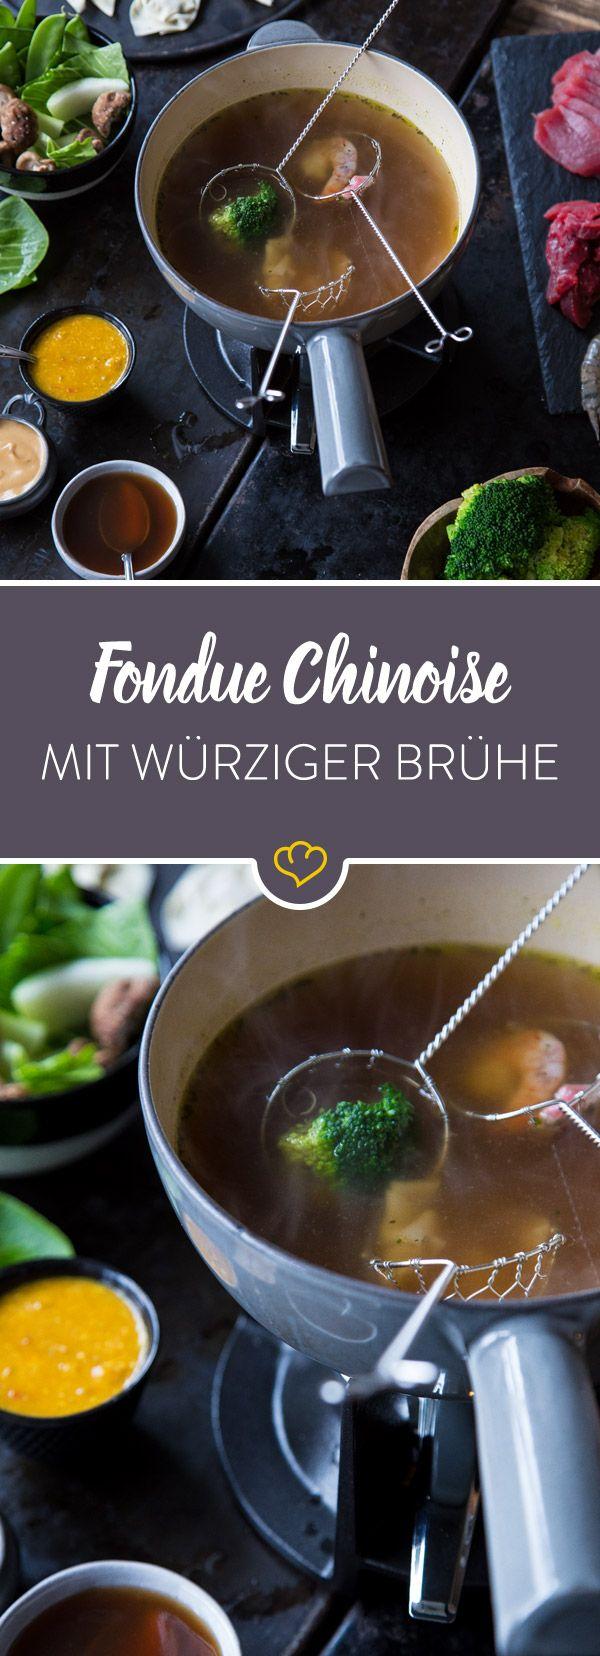 Alles andere als fettig: Buntes Fondue chinoise #fondue